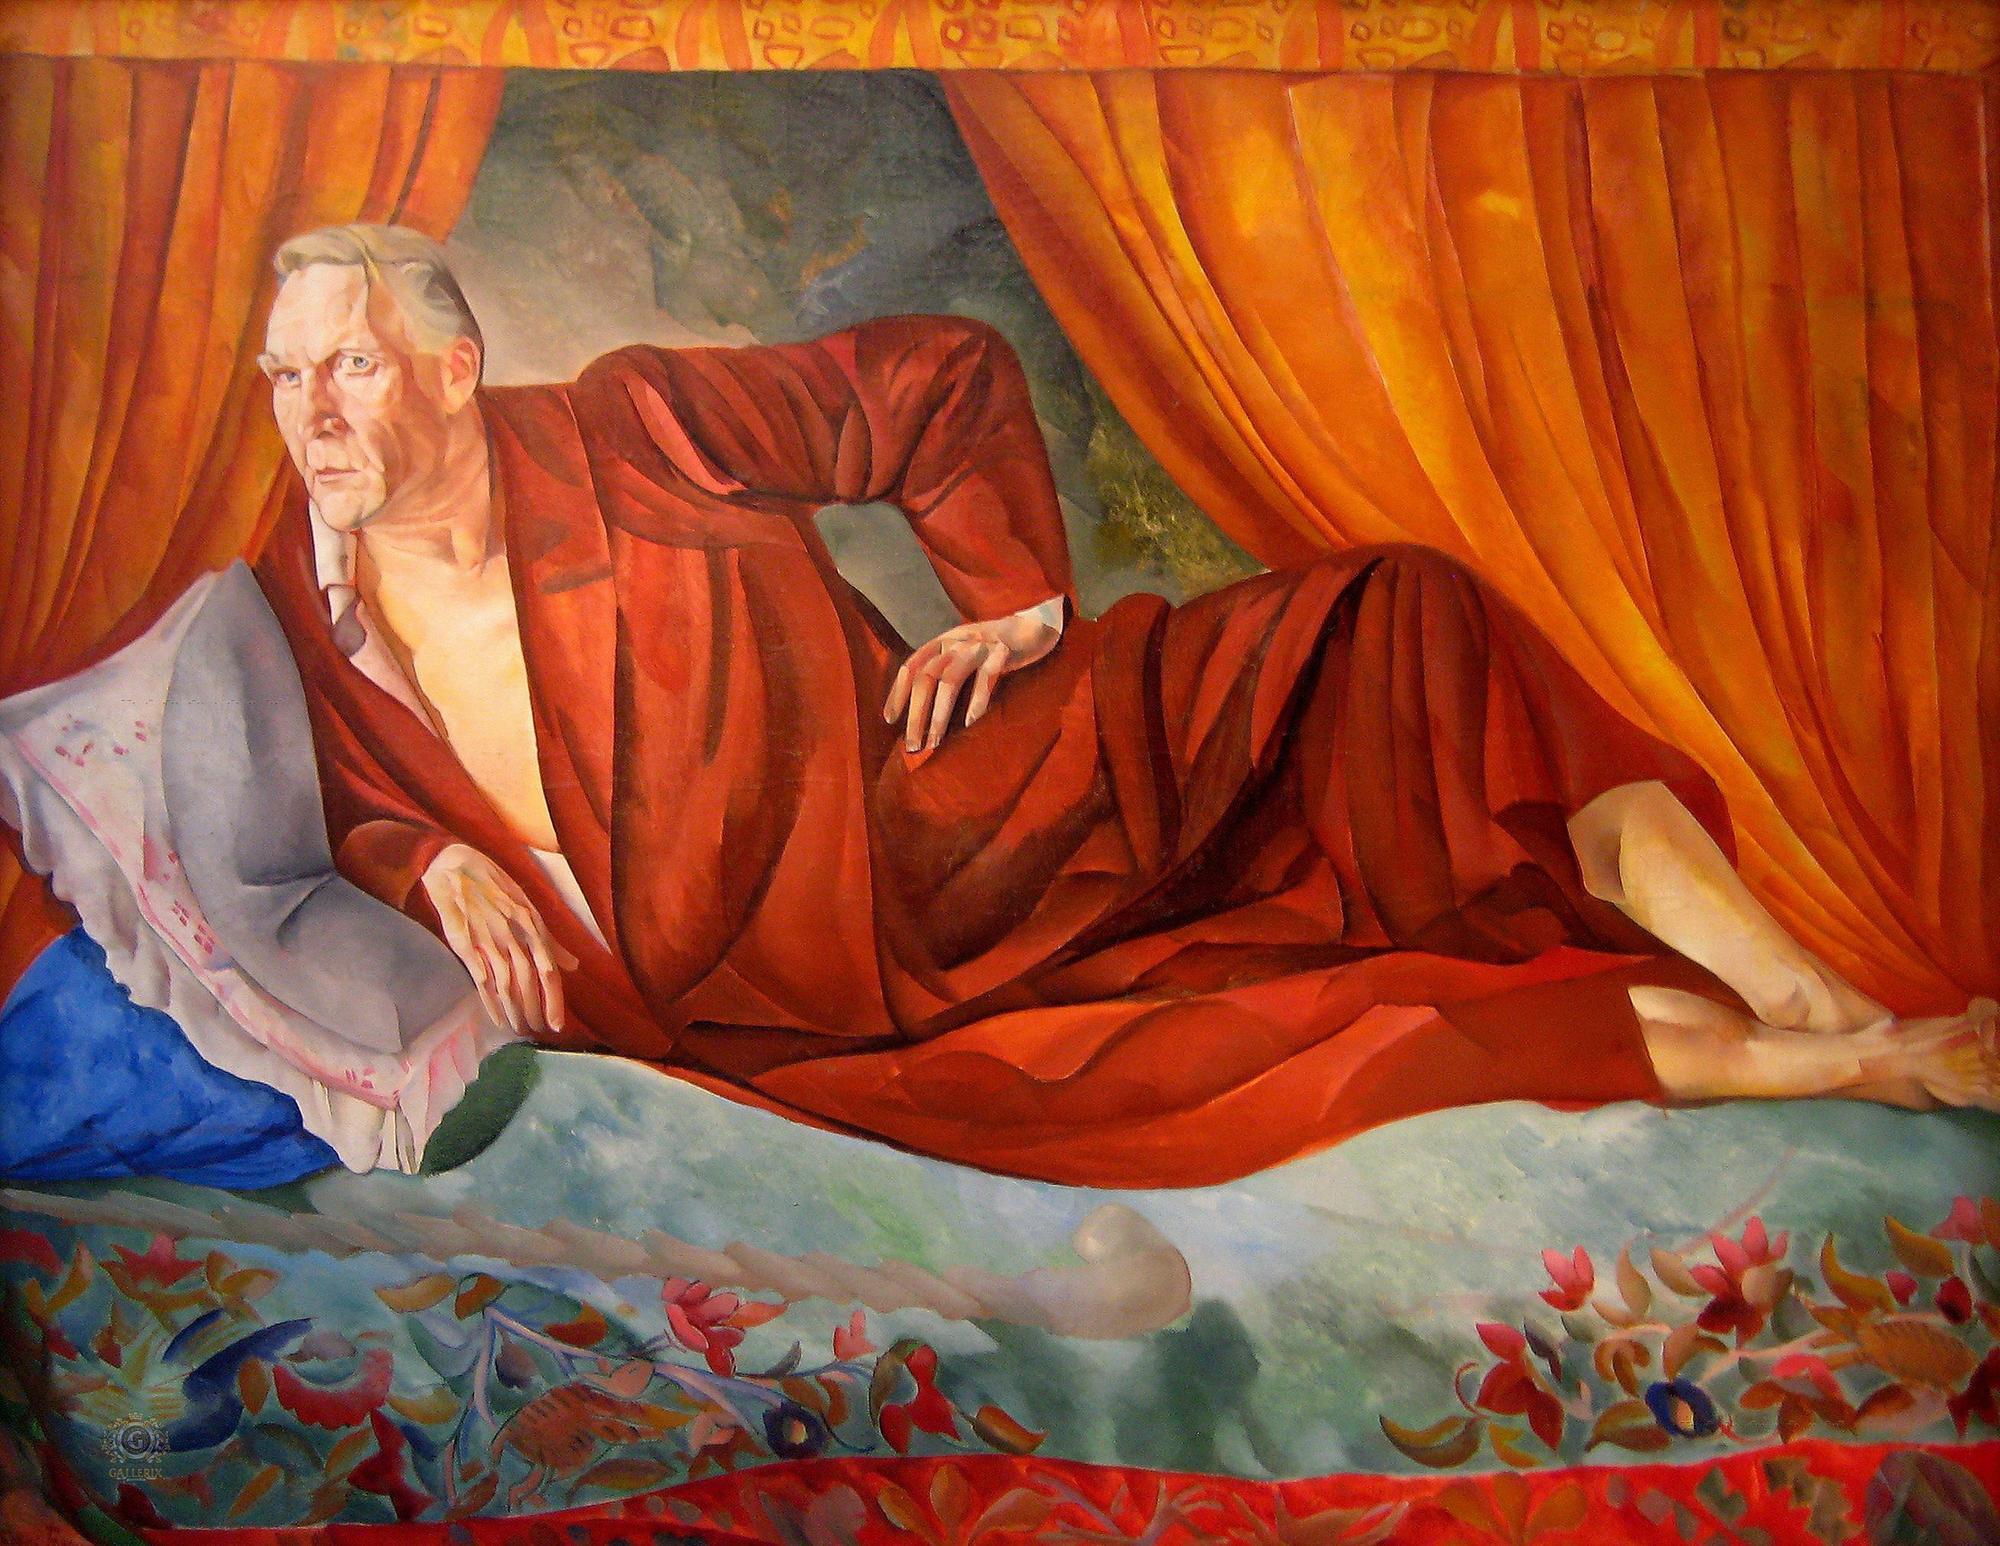 Борис Григорьев. Портрет Федора Шаляпина. 1918